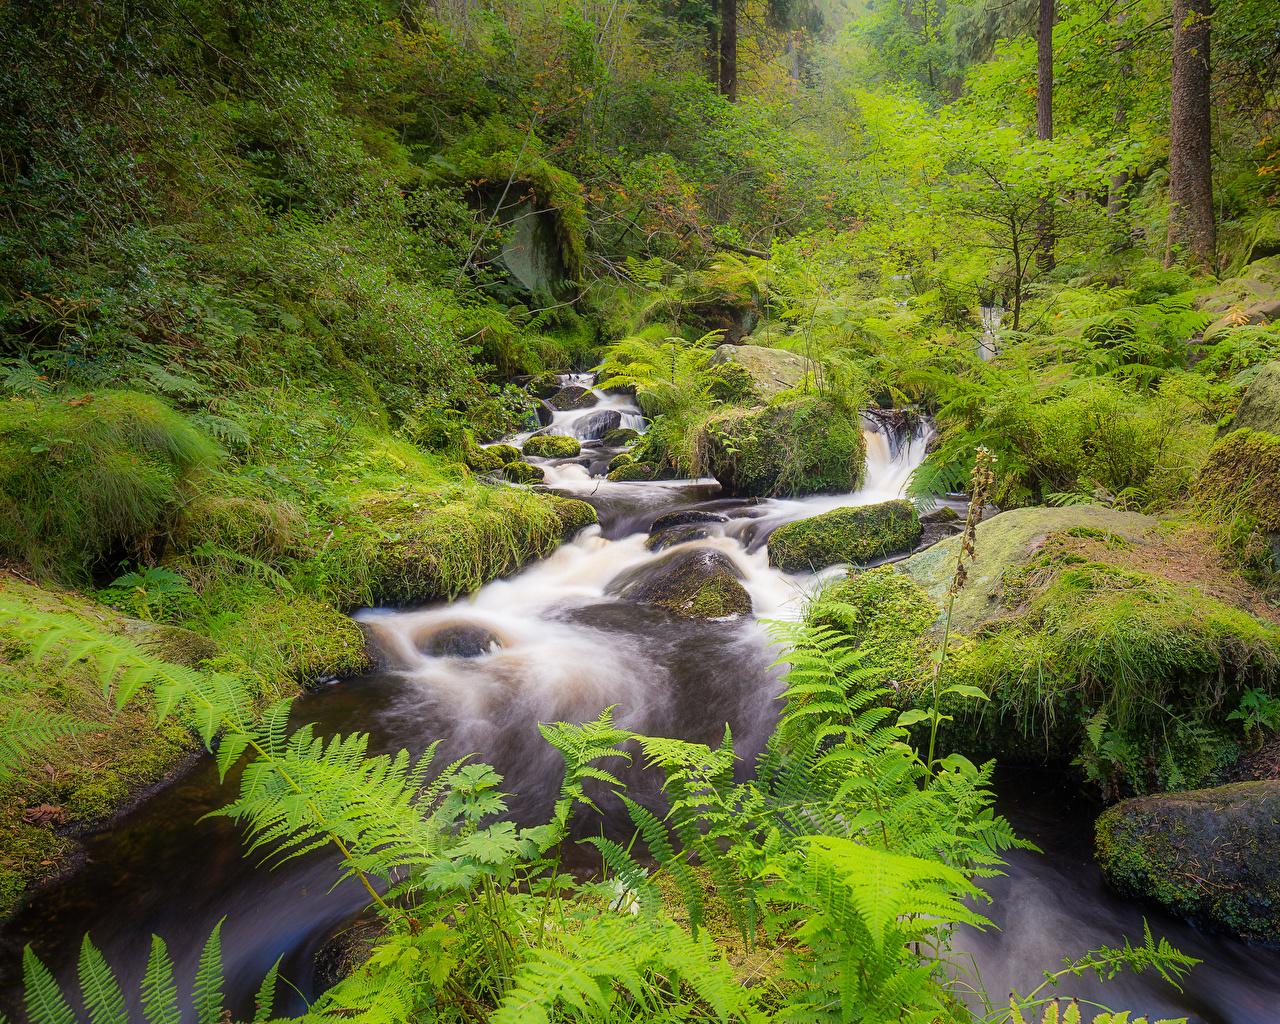 Фото Англия Wyming Brook, Sheffield Природа лес мха Реки Камни Леса Мох река мхом речка Камень